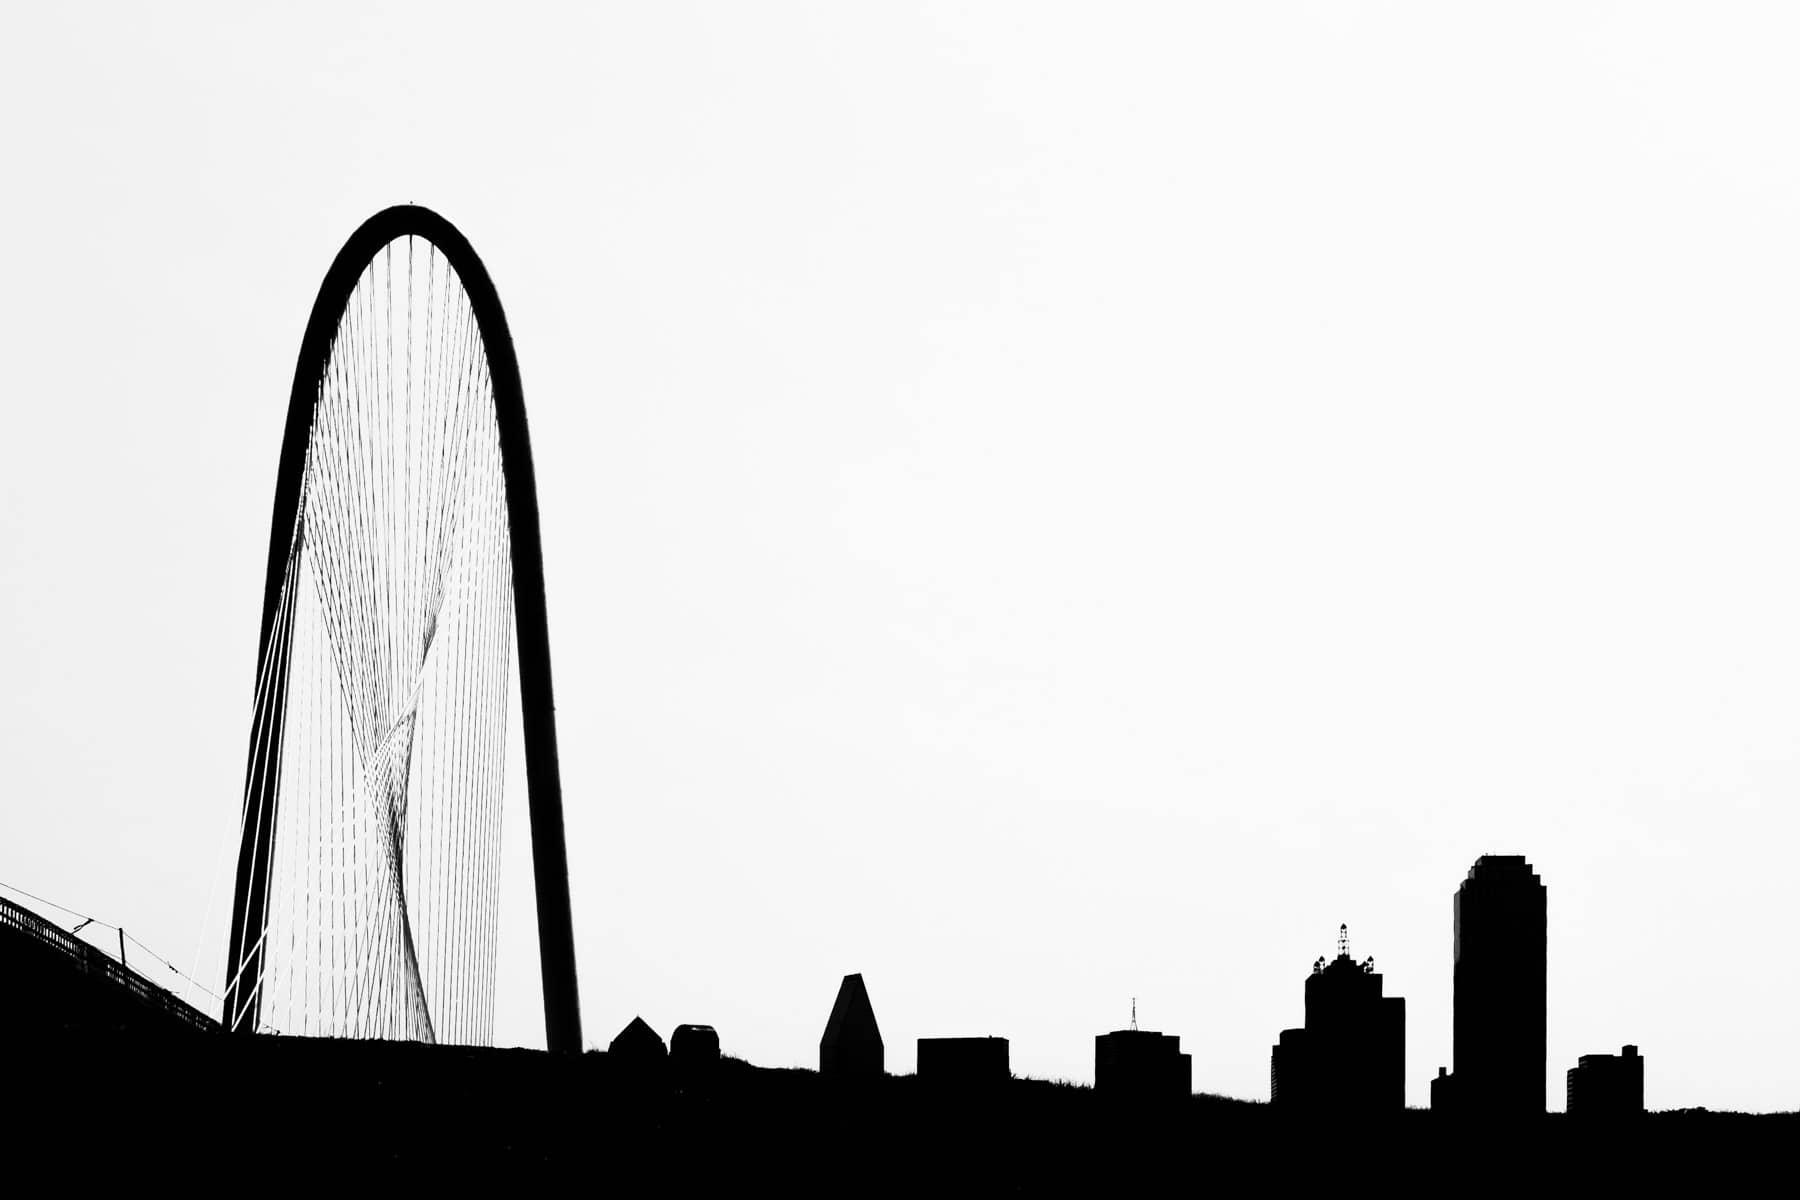 Dallas' Santiago Calatrava-designed Margaret Hunt Hill Bridge rises over the city's skyline.